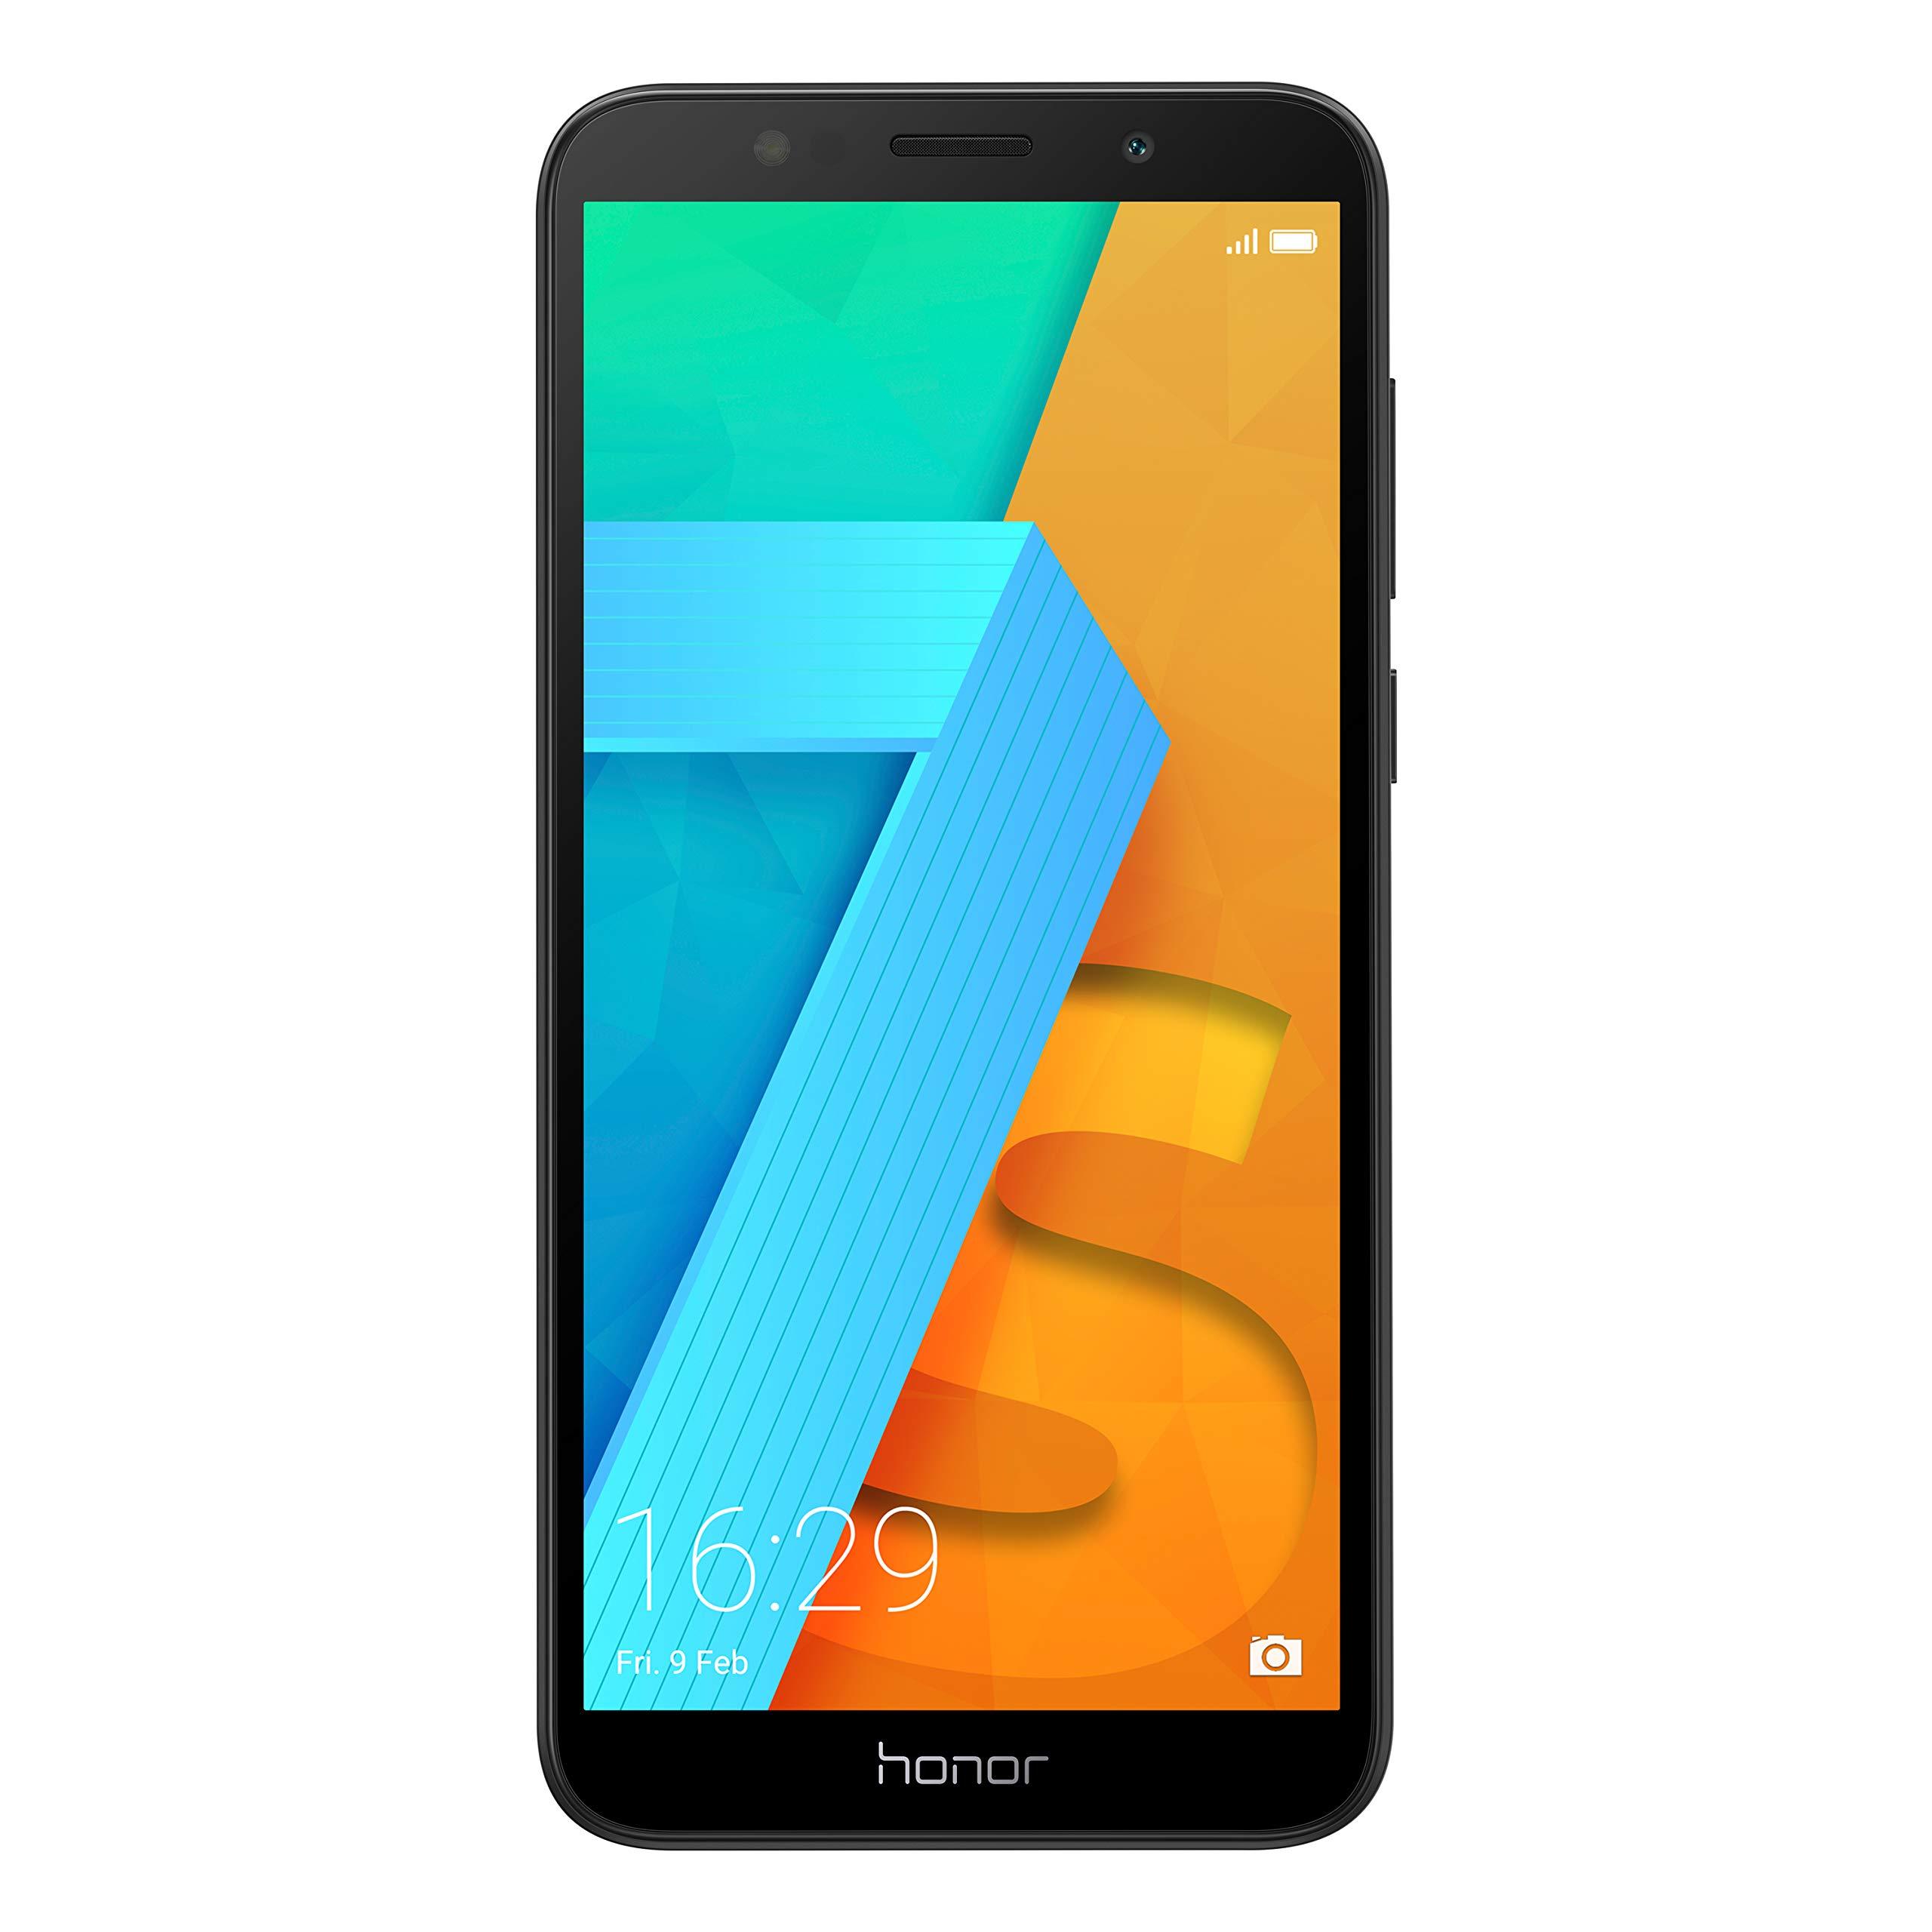 Huawei Honor 7S Dual SIM 16GB Black: Amazon.es: Electrónica